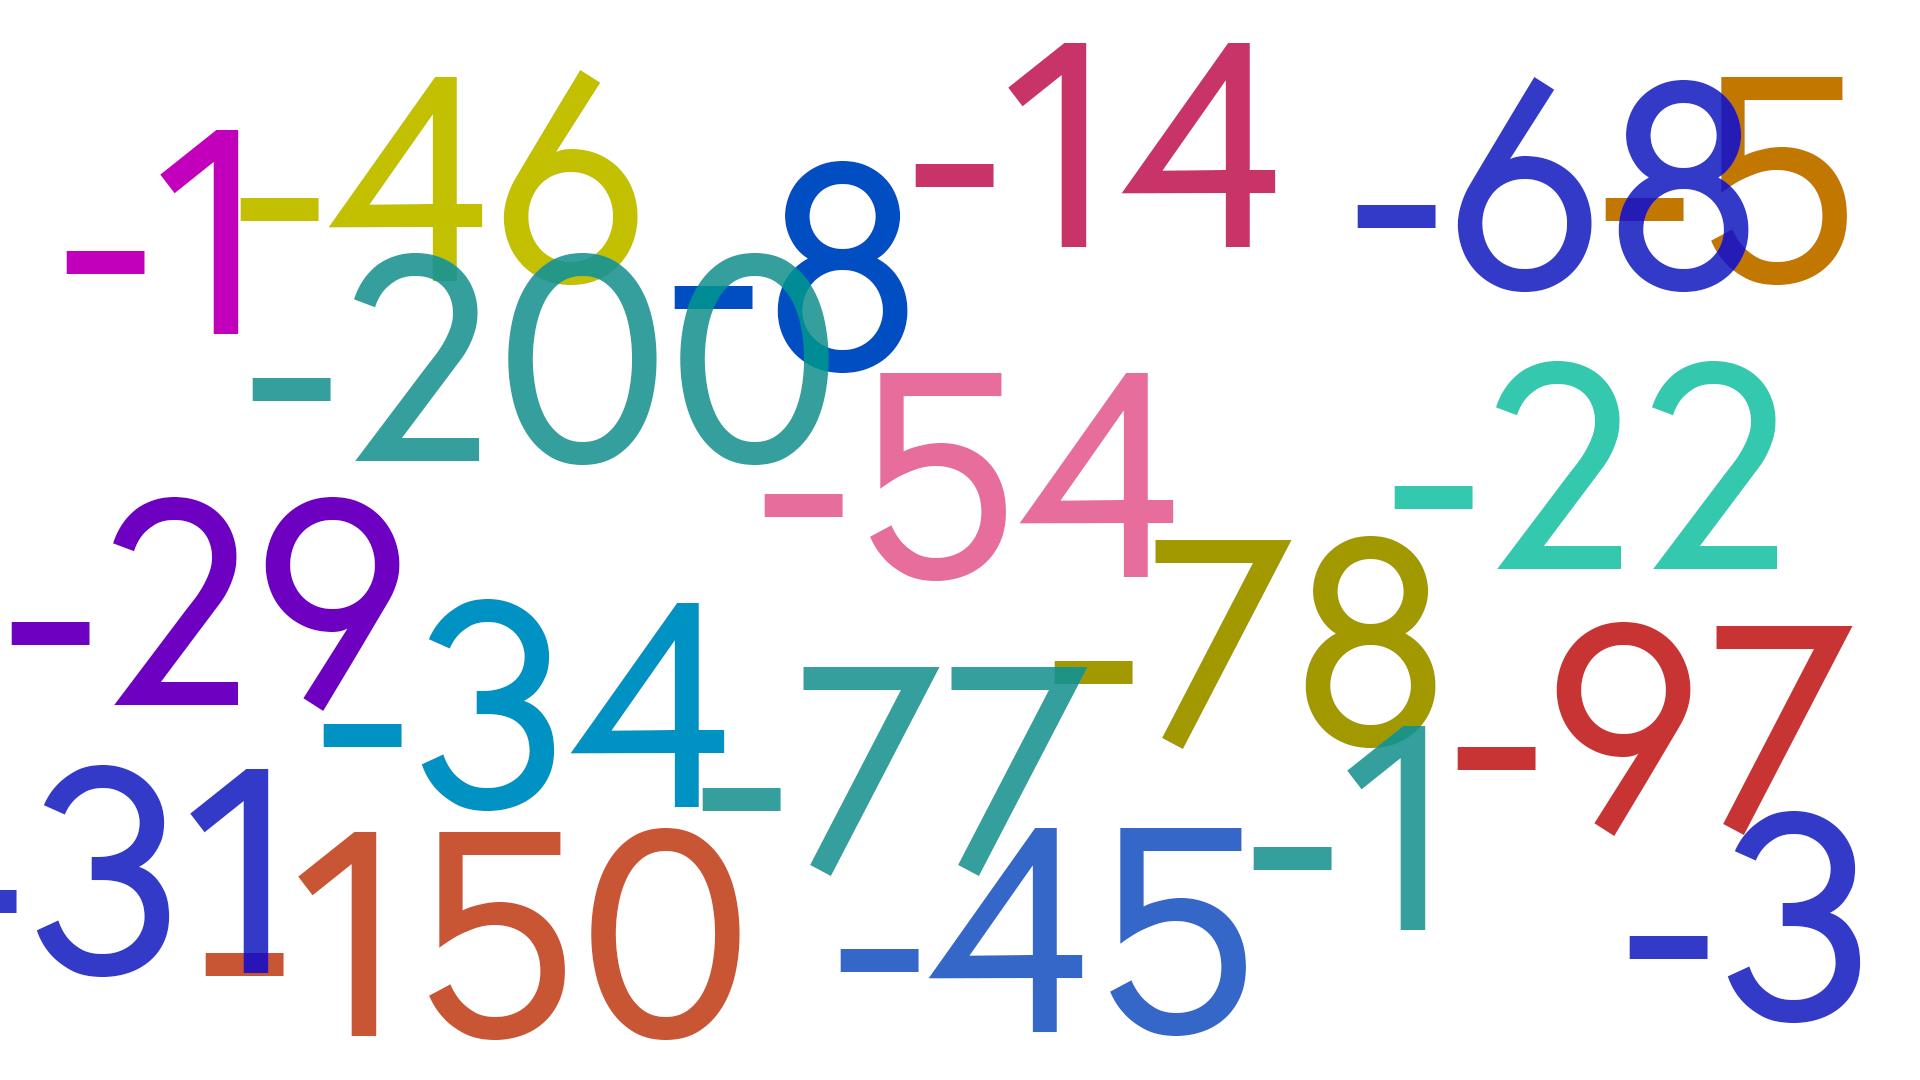 Multi-coloured negative numbers